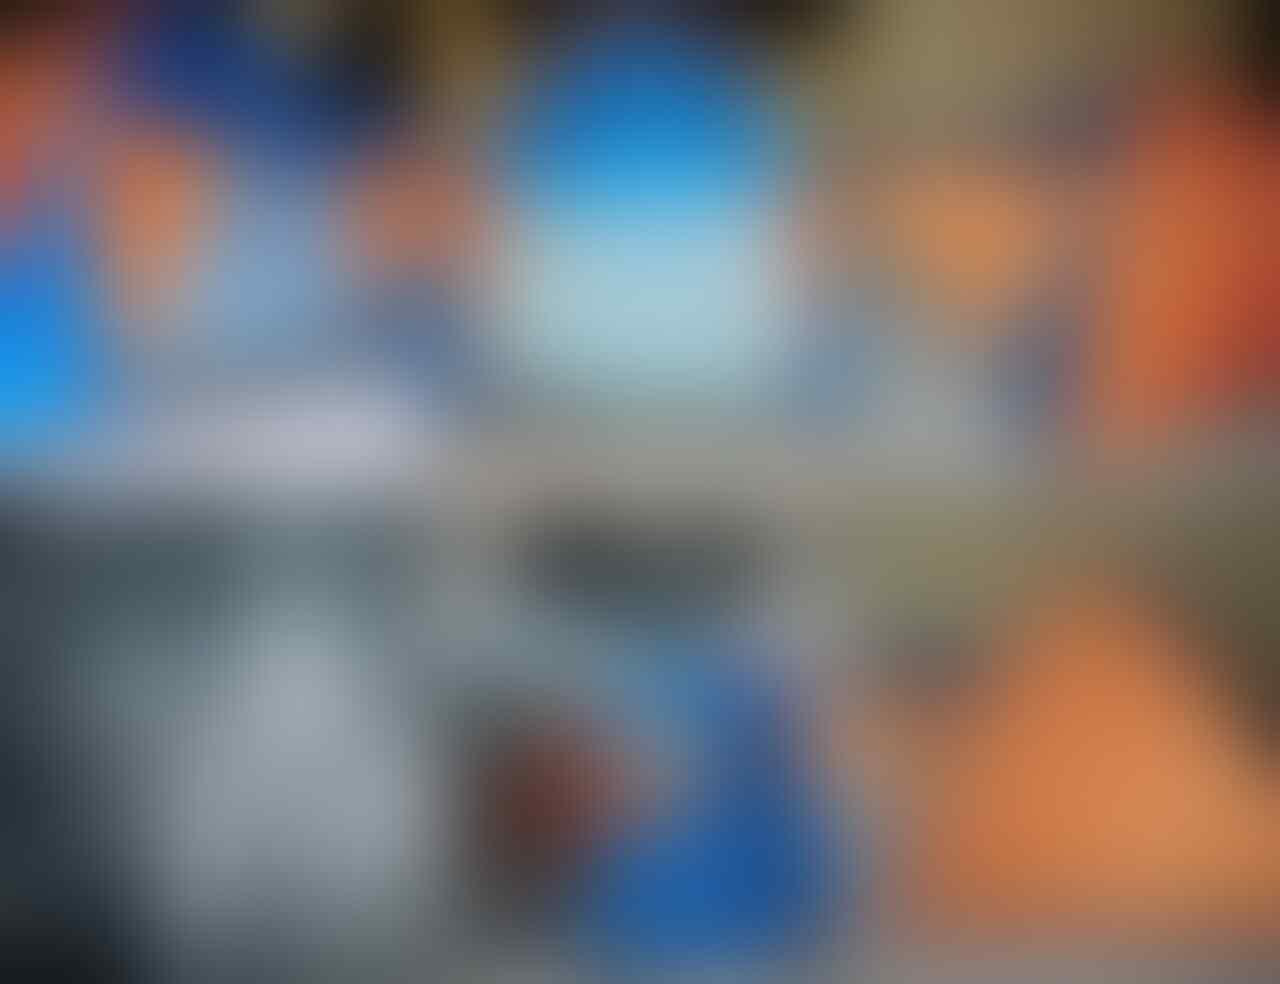 Terjual Tenda Gunung Lafuma Hanlu Kaskus Frame Alloy For Campo 2